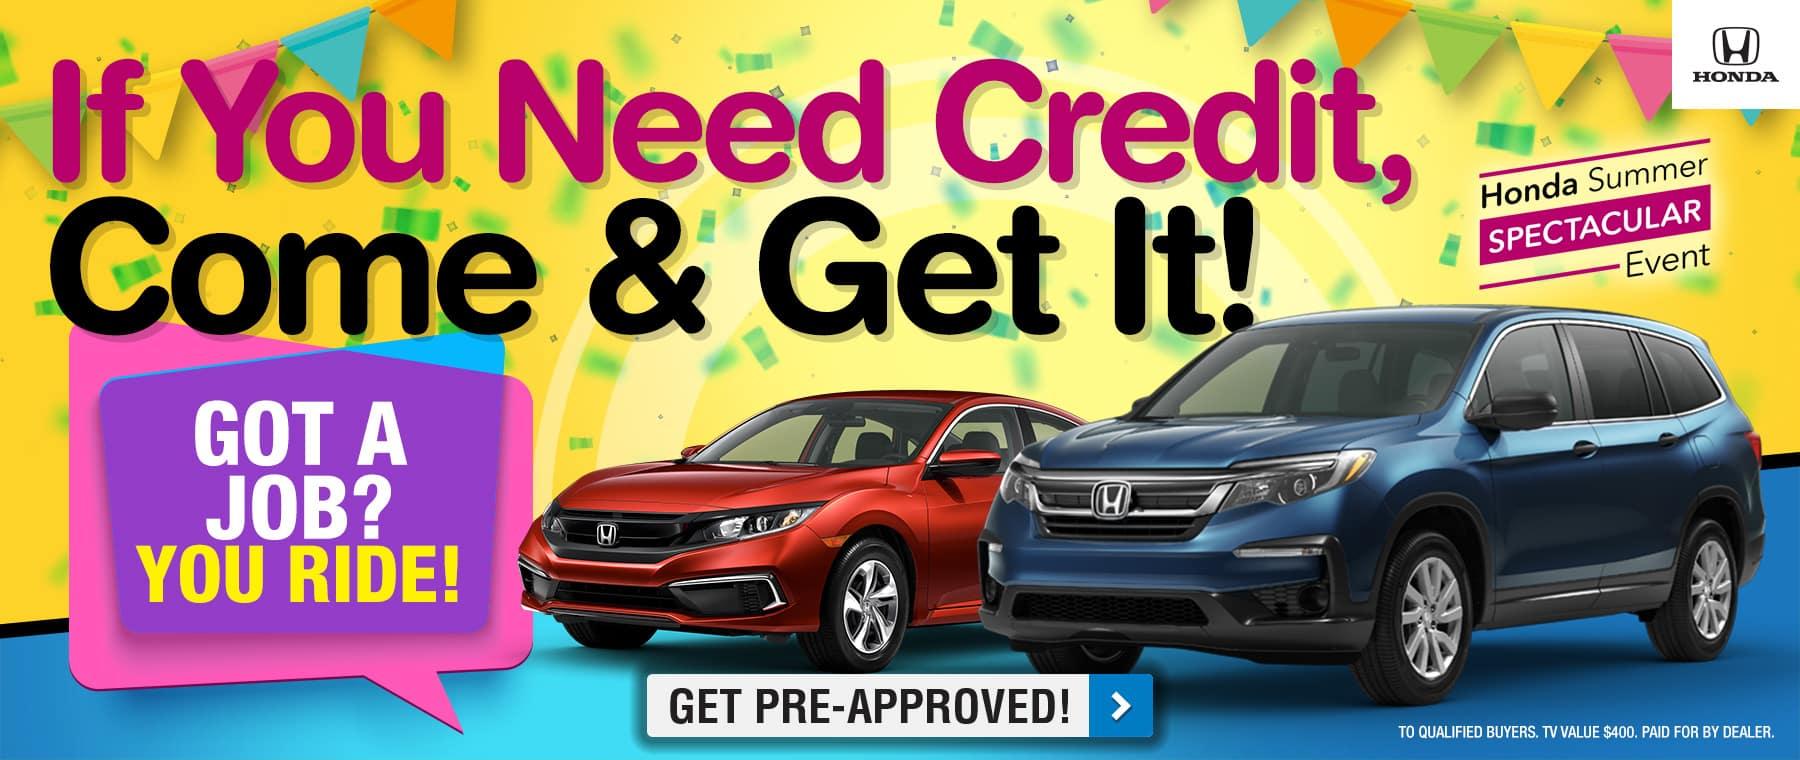 Honda Dealers In Ct >> Honda Dealer In New Britain Serving Middletown Newington